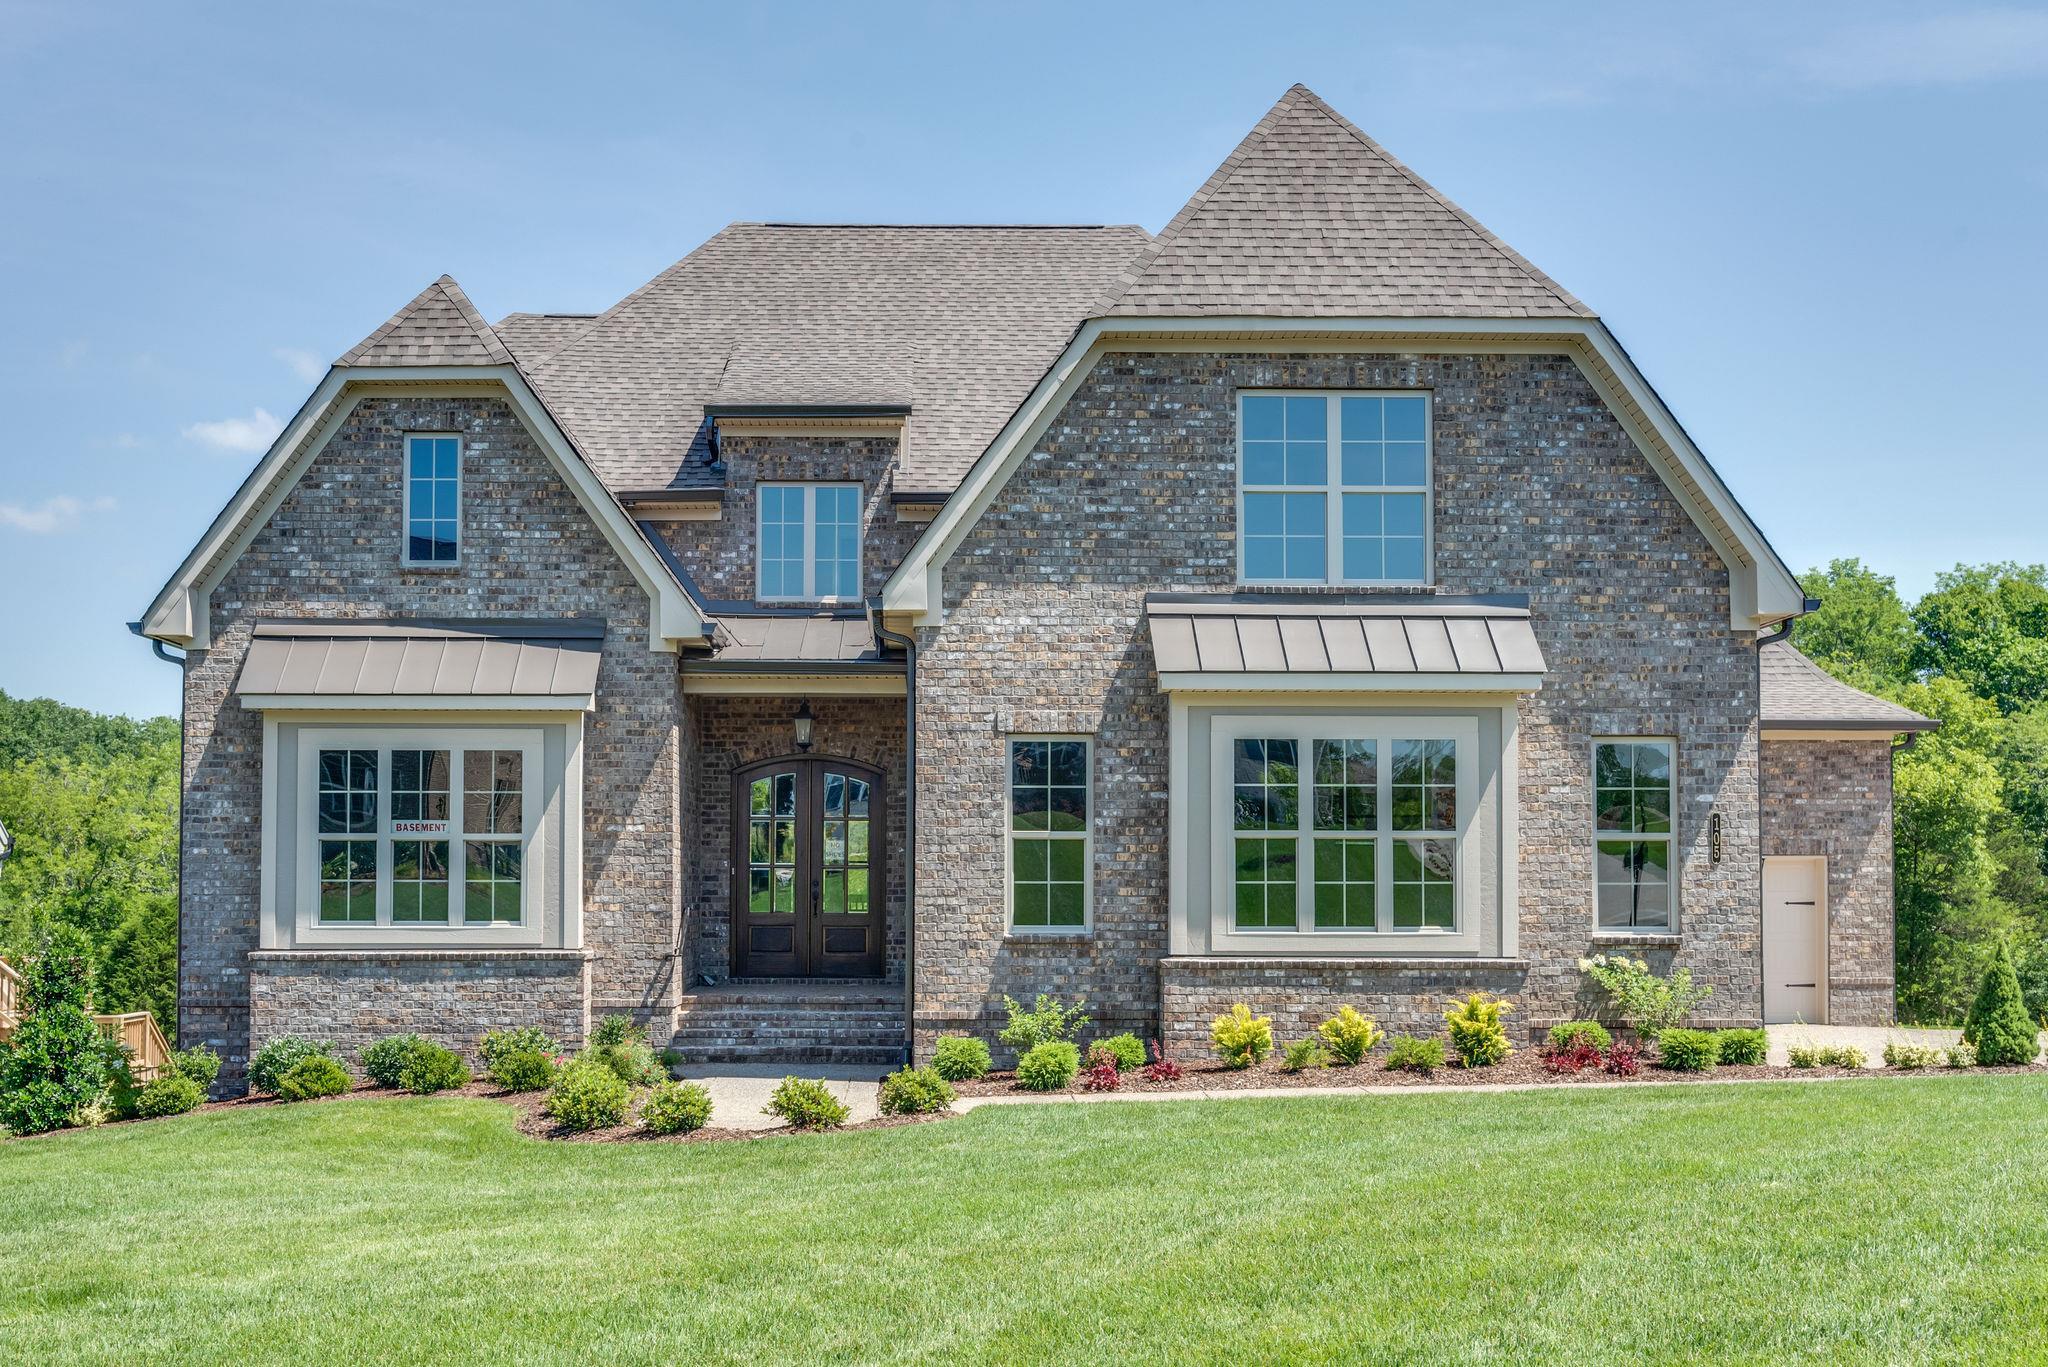 105 Watertown Dr Lot 1008, Nolensville, TN 37135 - Nolensville, TN real estate listing